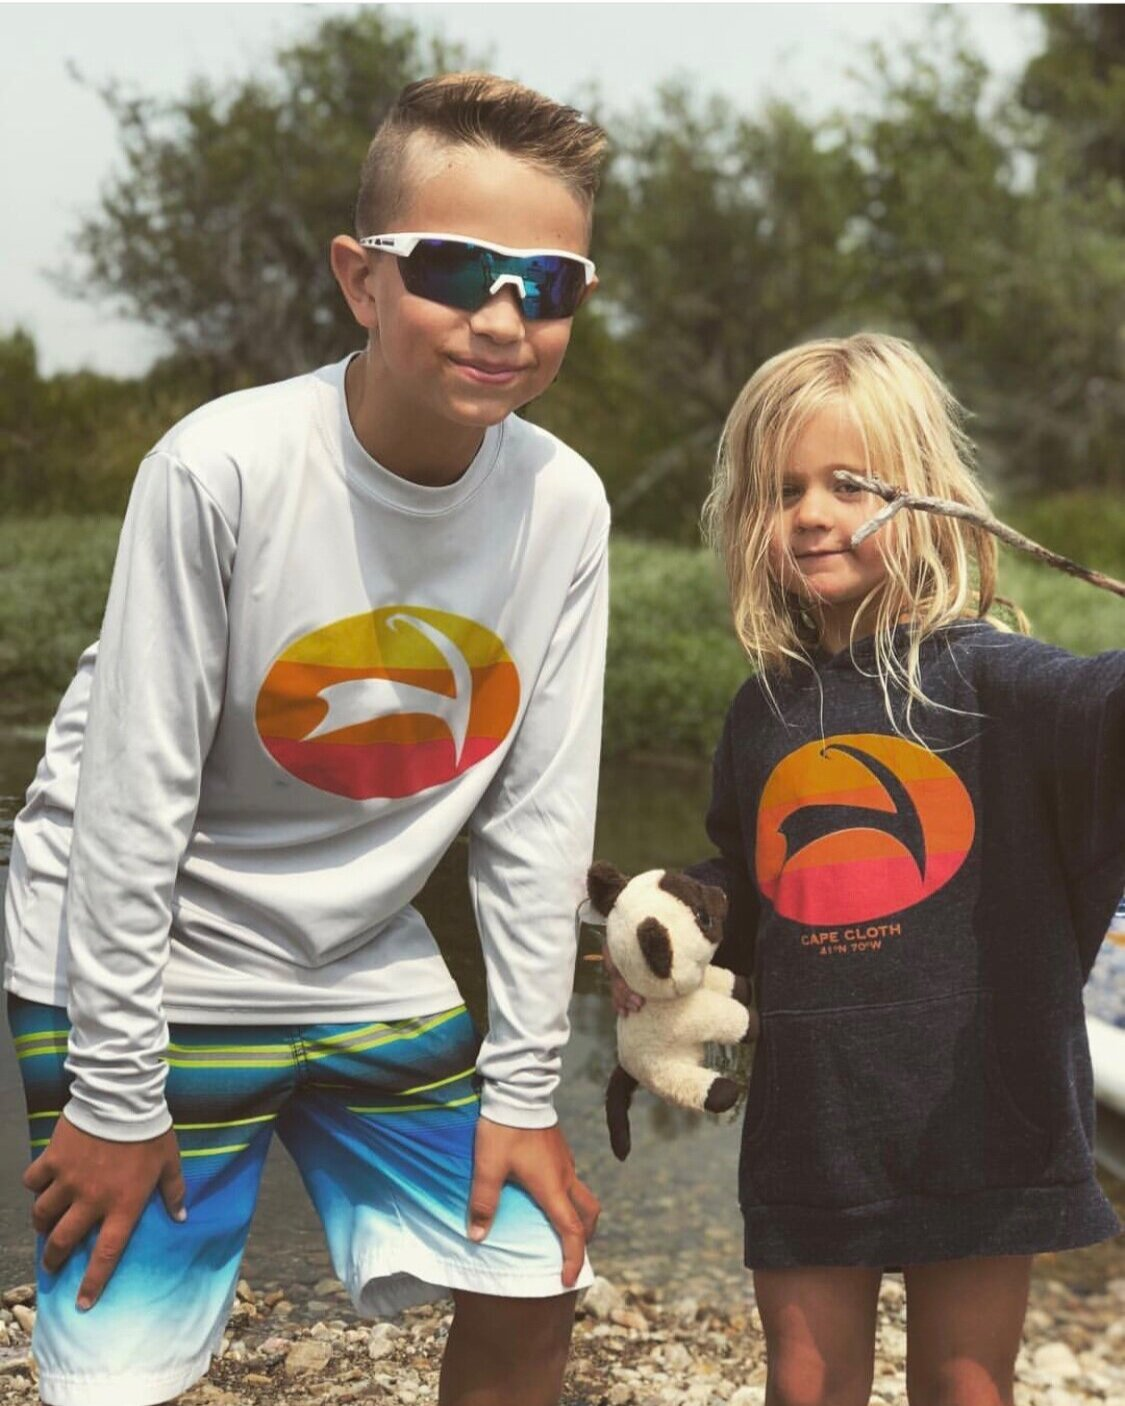 Cape Cod Clothing